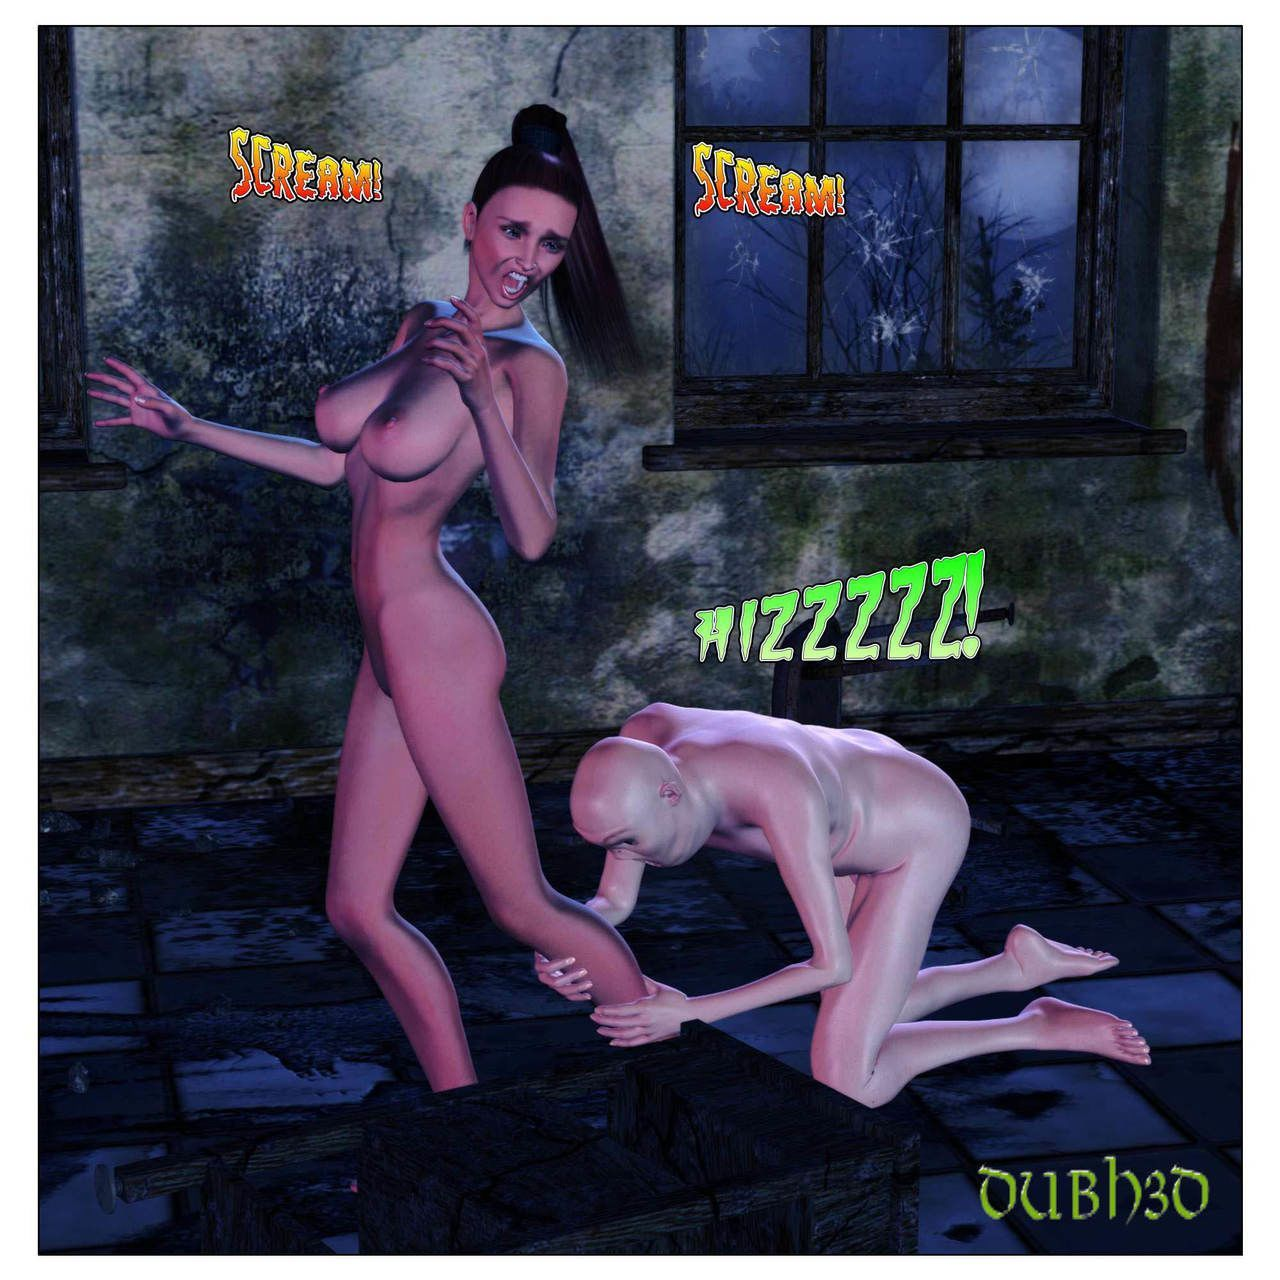 Dubhgilla - Angie Everheart